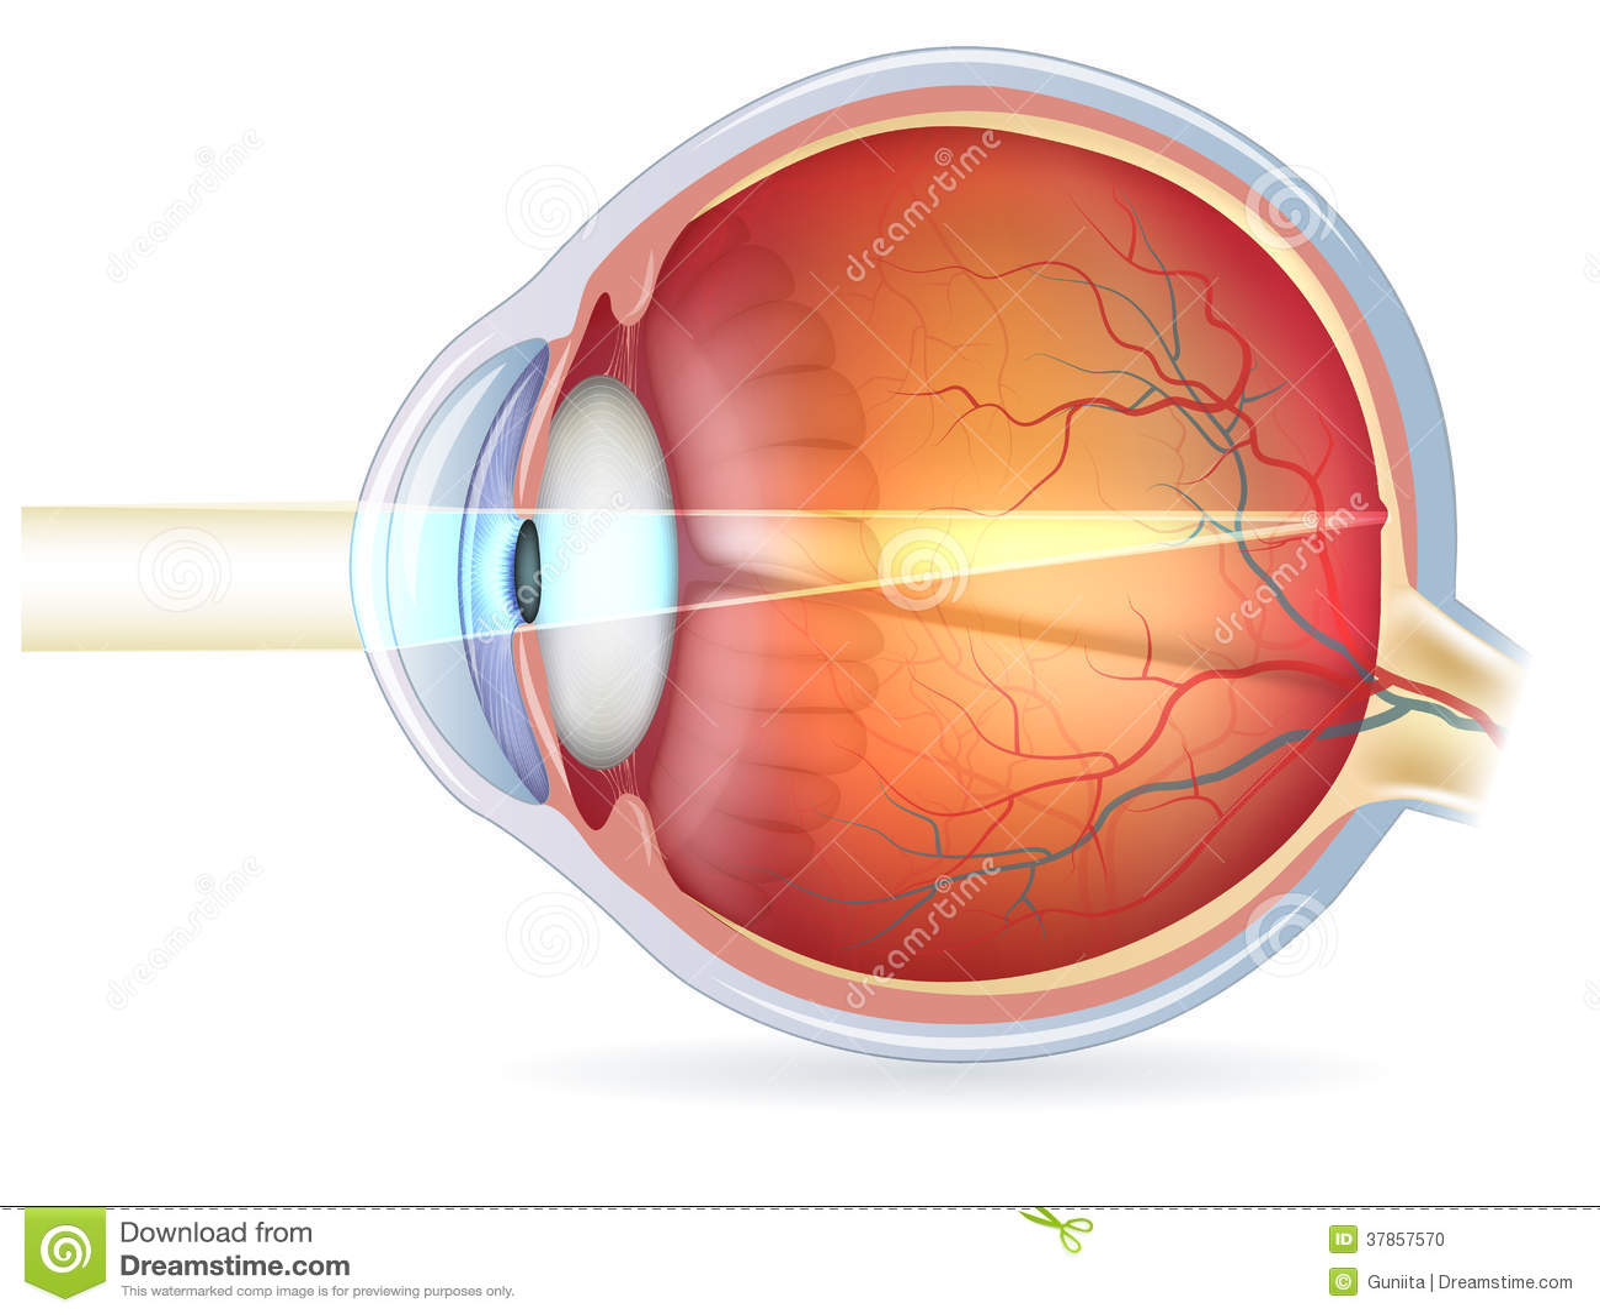 The Eye And Vision Anatomy Worksheet Song 4u